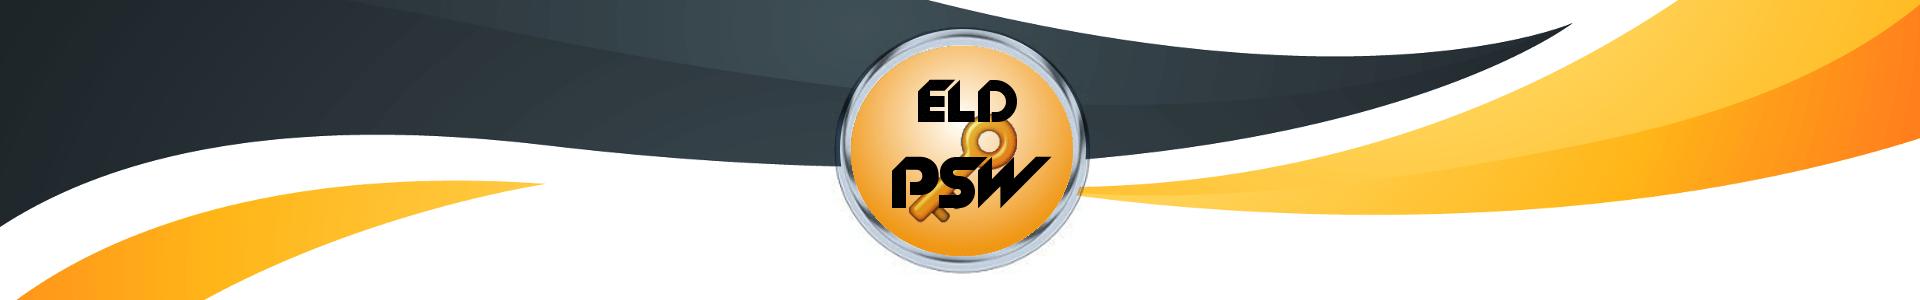 ELD Reset password Notes Domino